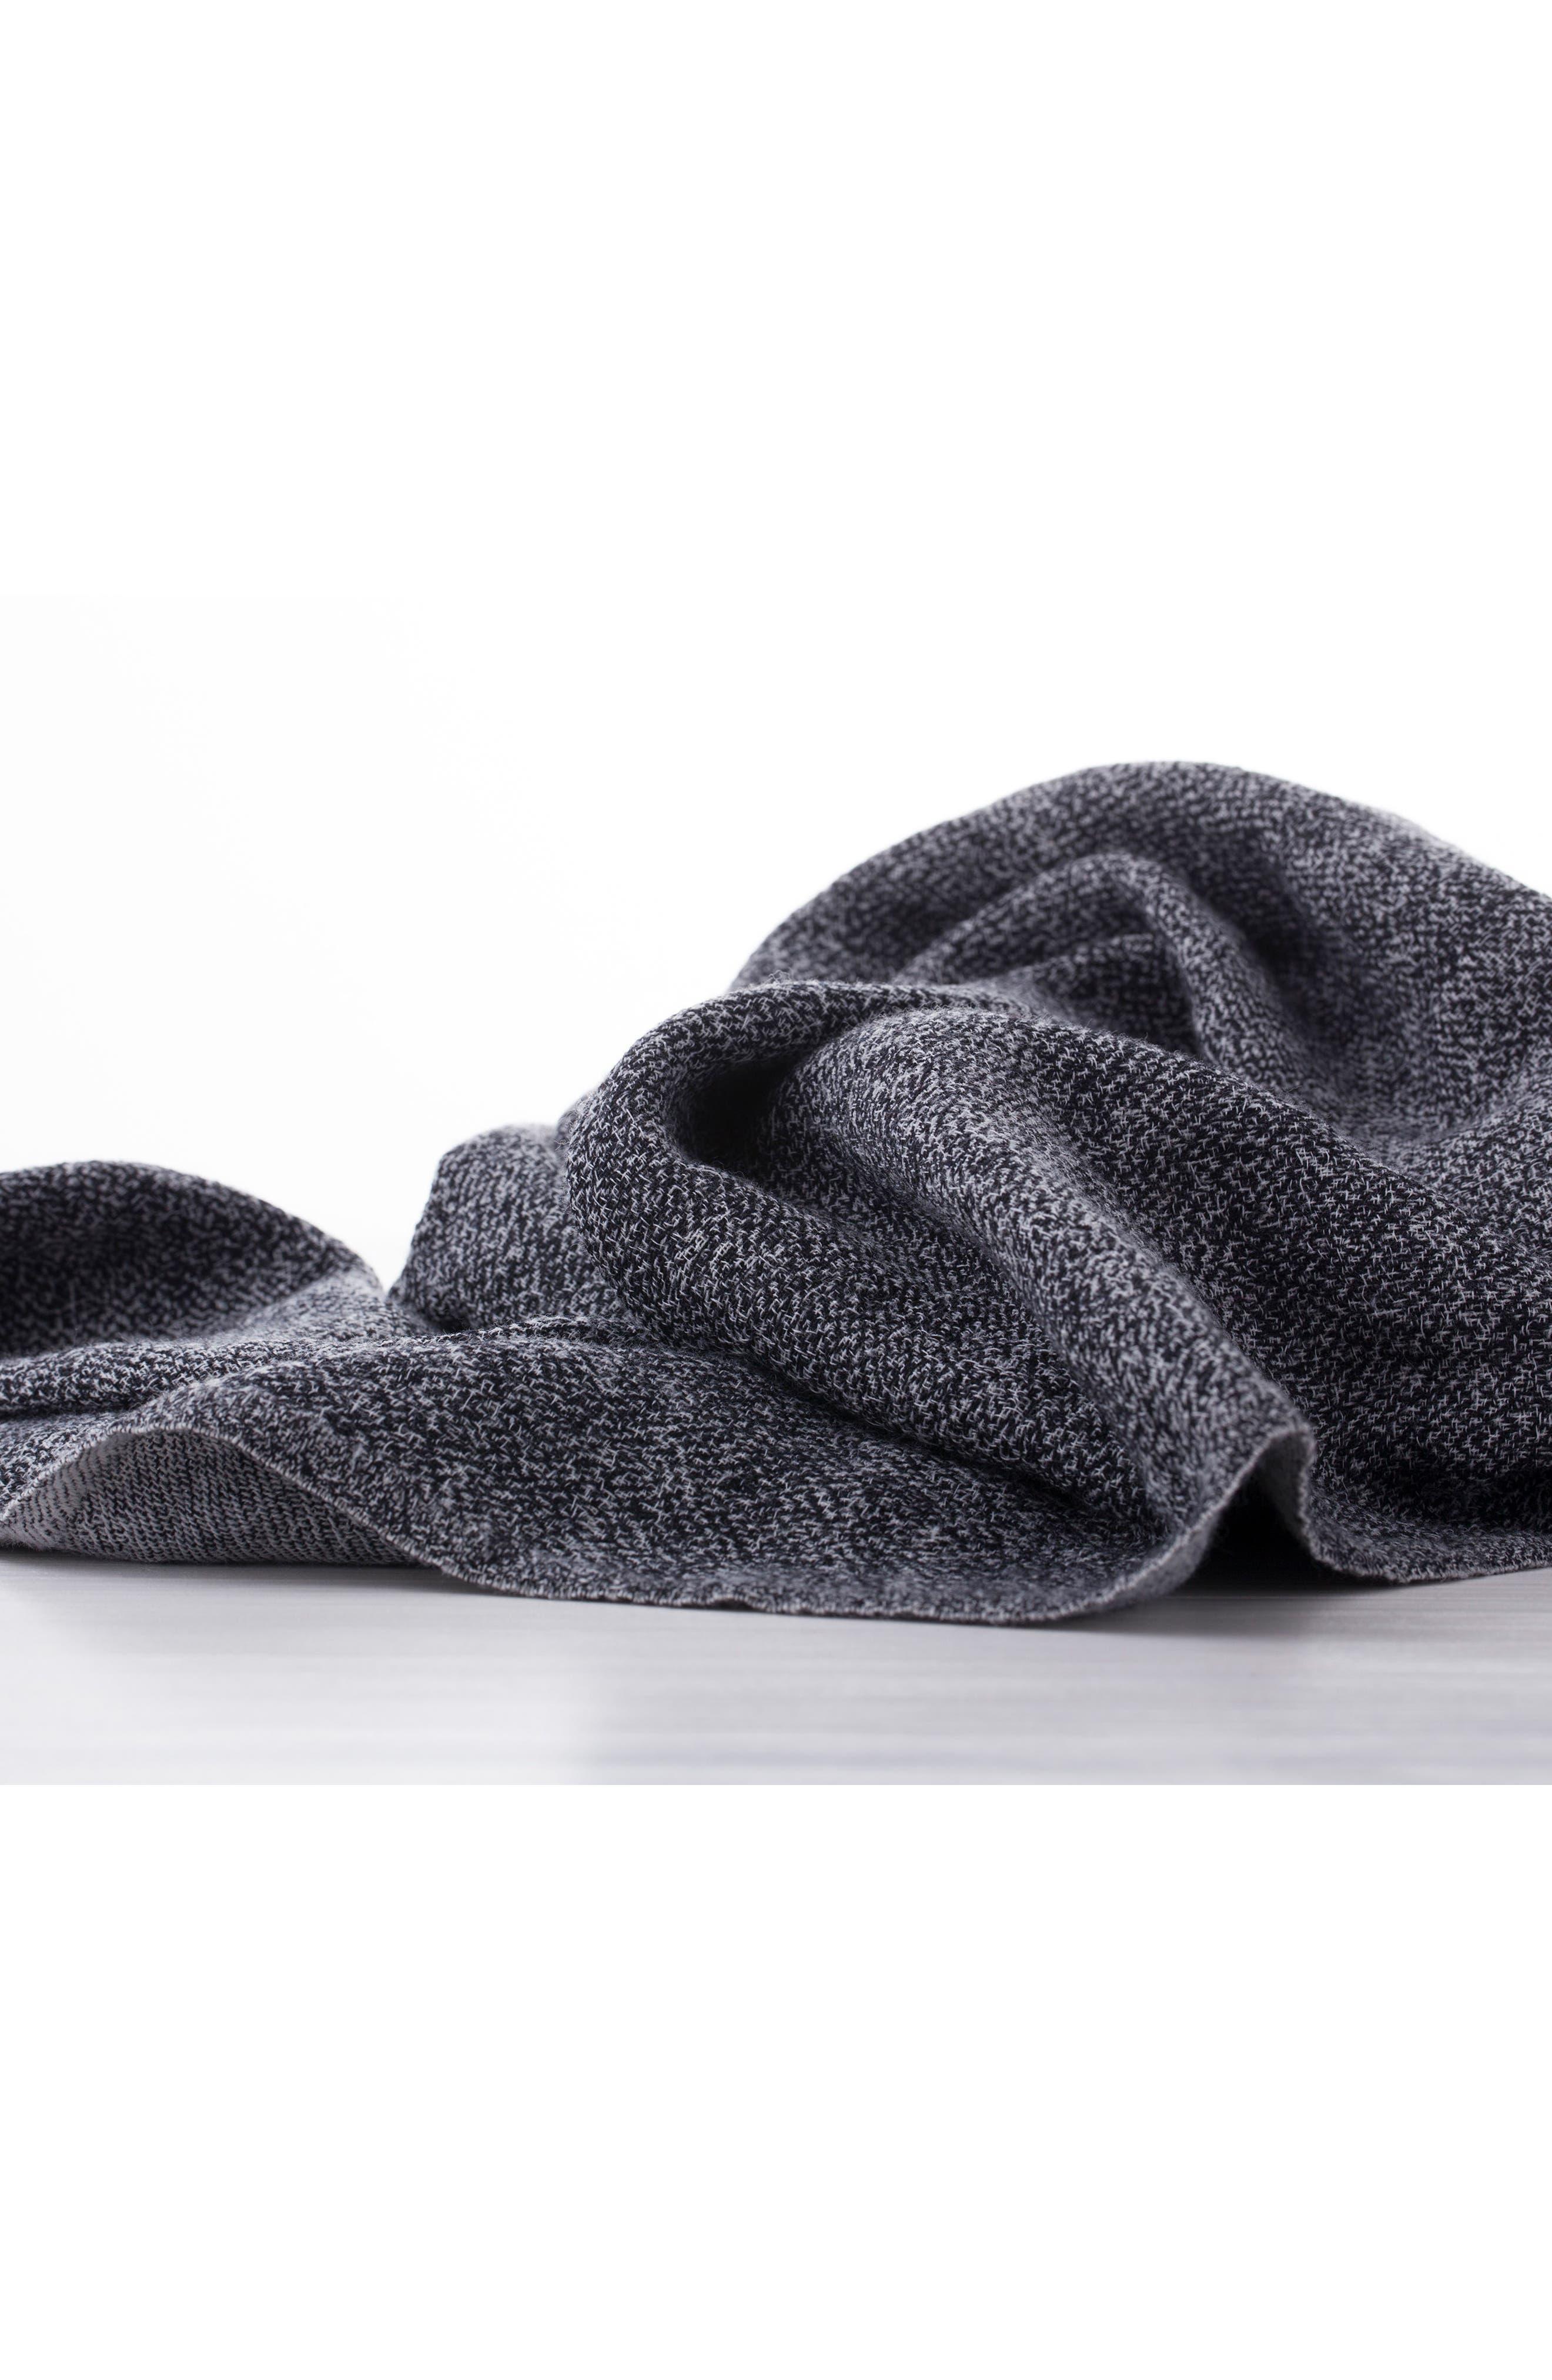 Blurred Herringbone Merino Wool Throw,                             Alternate thumbnail 3, color,                             Blurred Herringbone Grey